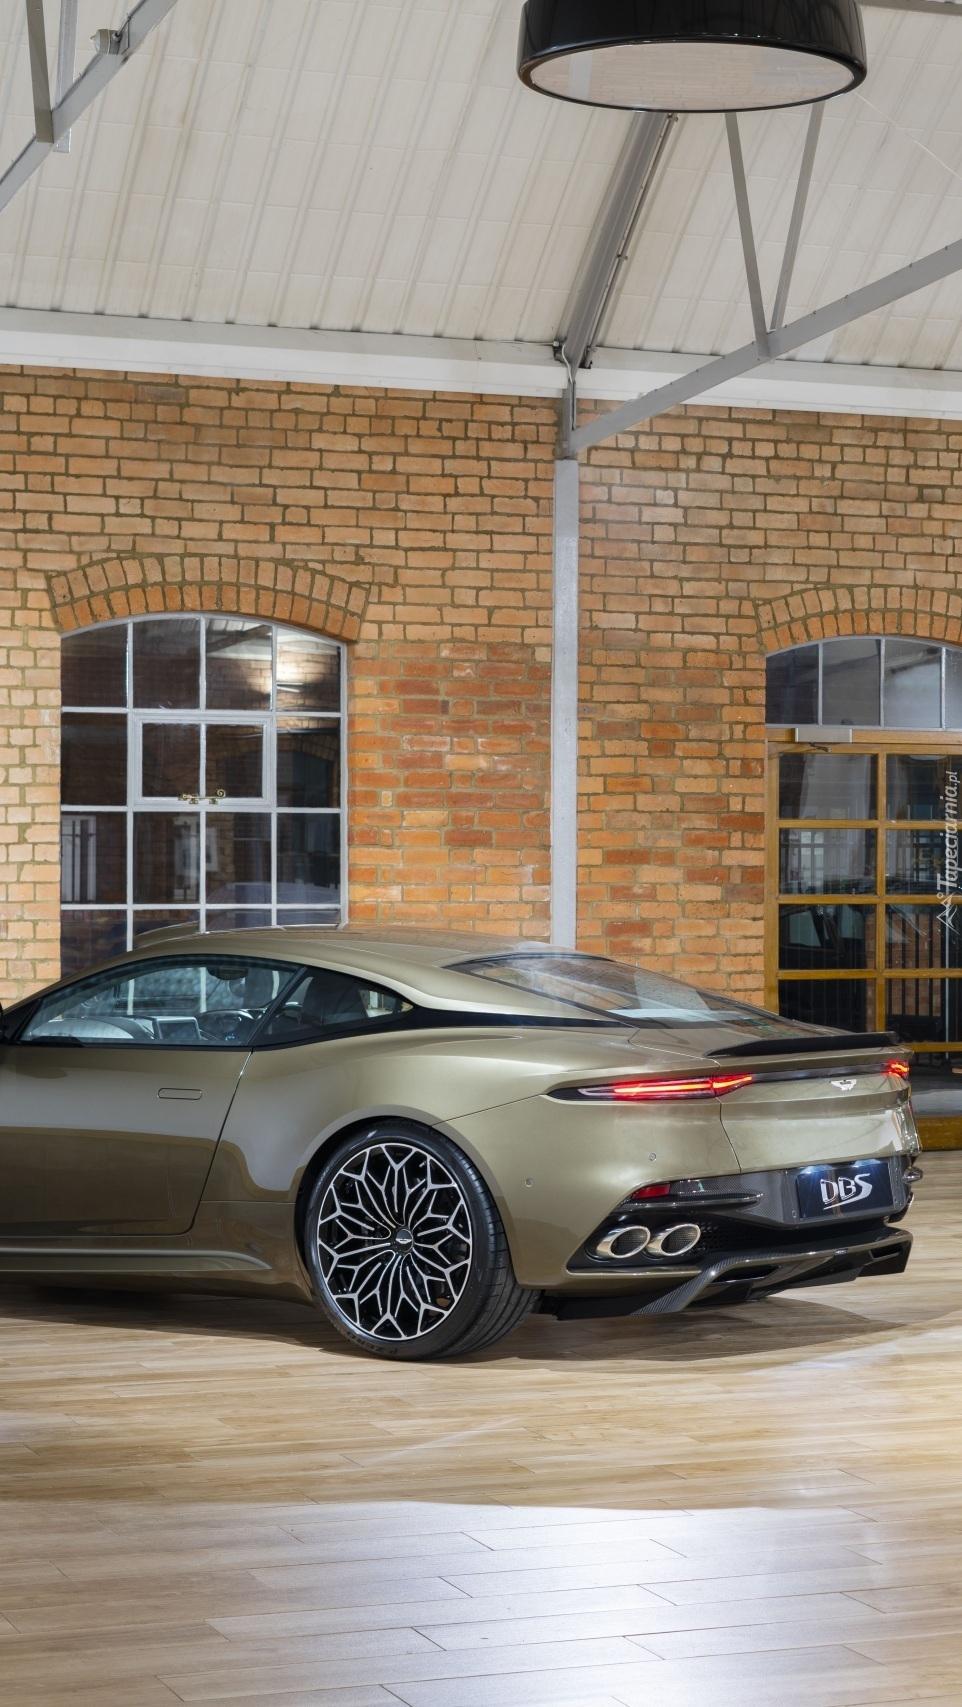 Aston Martin DBS bokiem